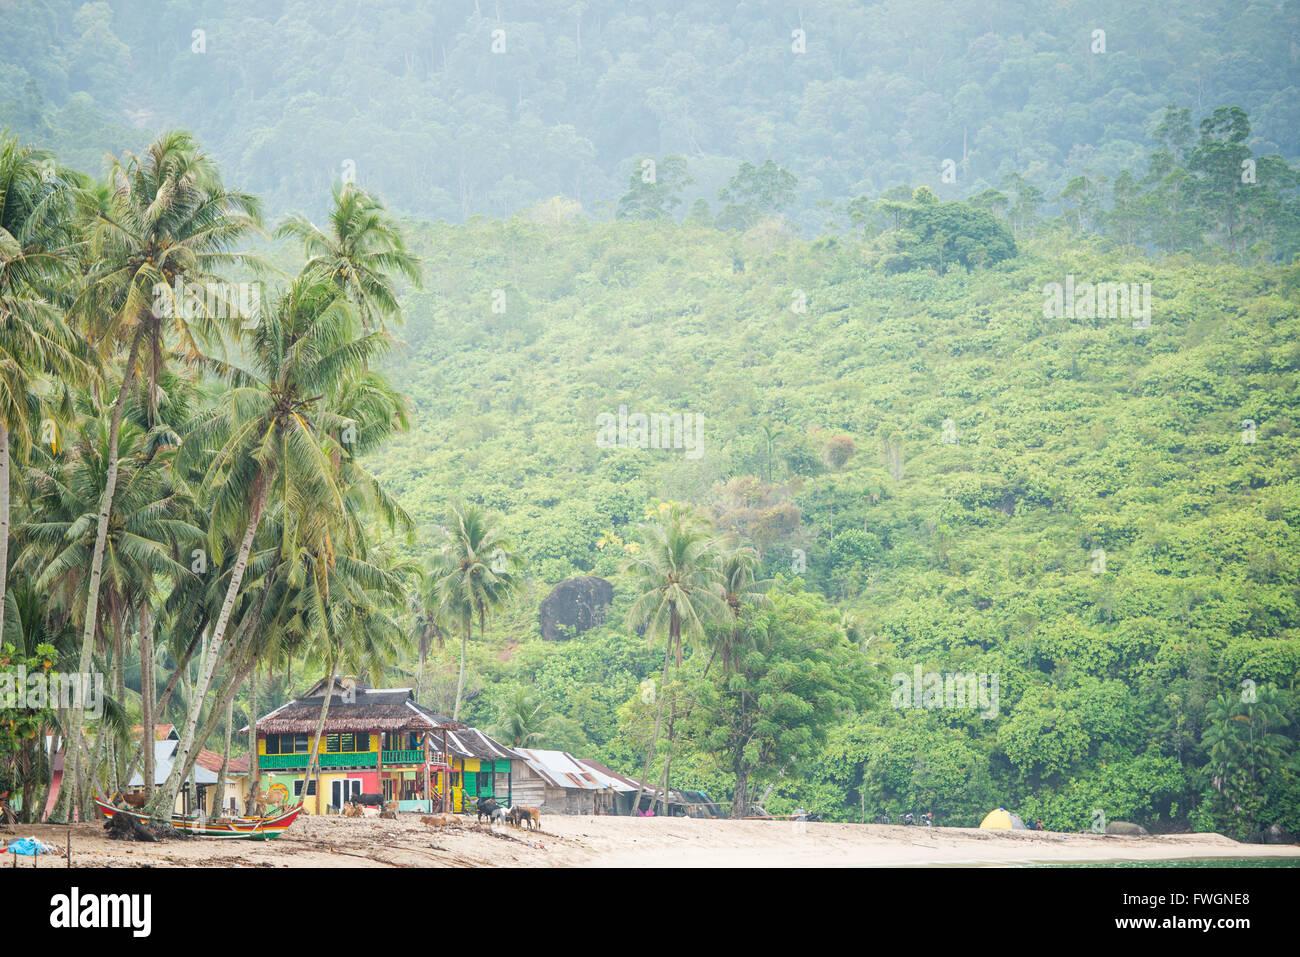 Sungai Pinang, West Sumatra, Indonesia, Southeast Asia - Stock Image